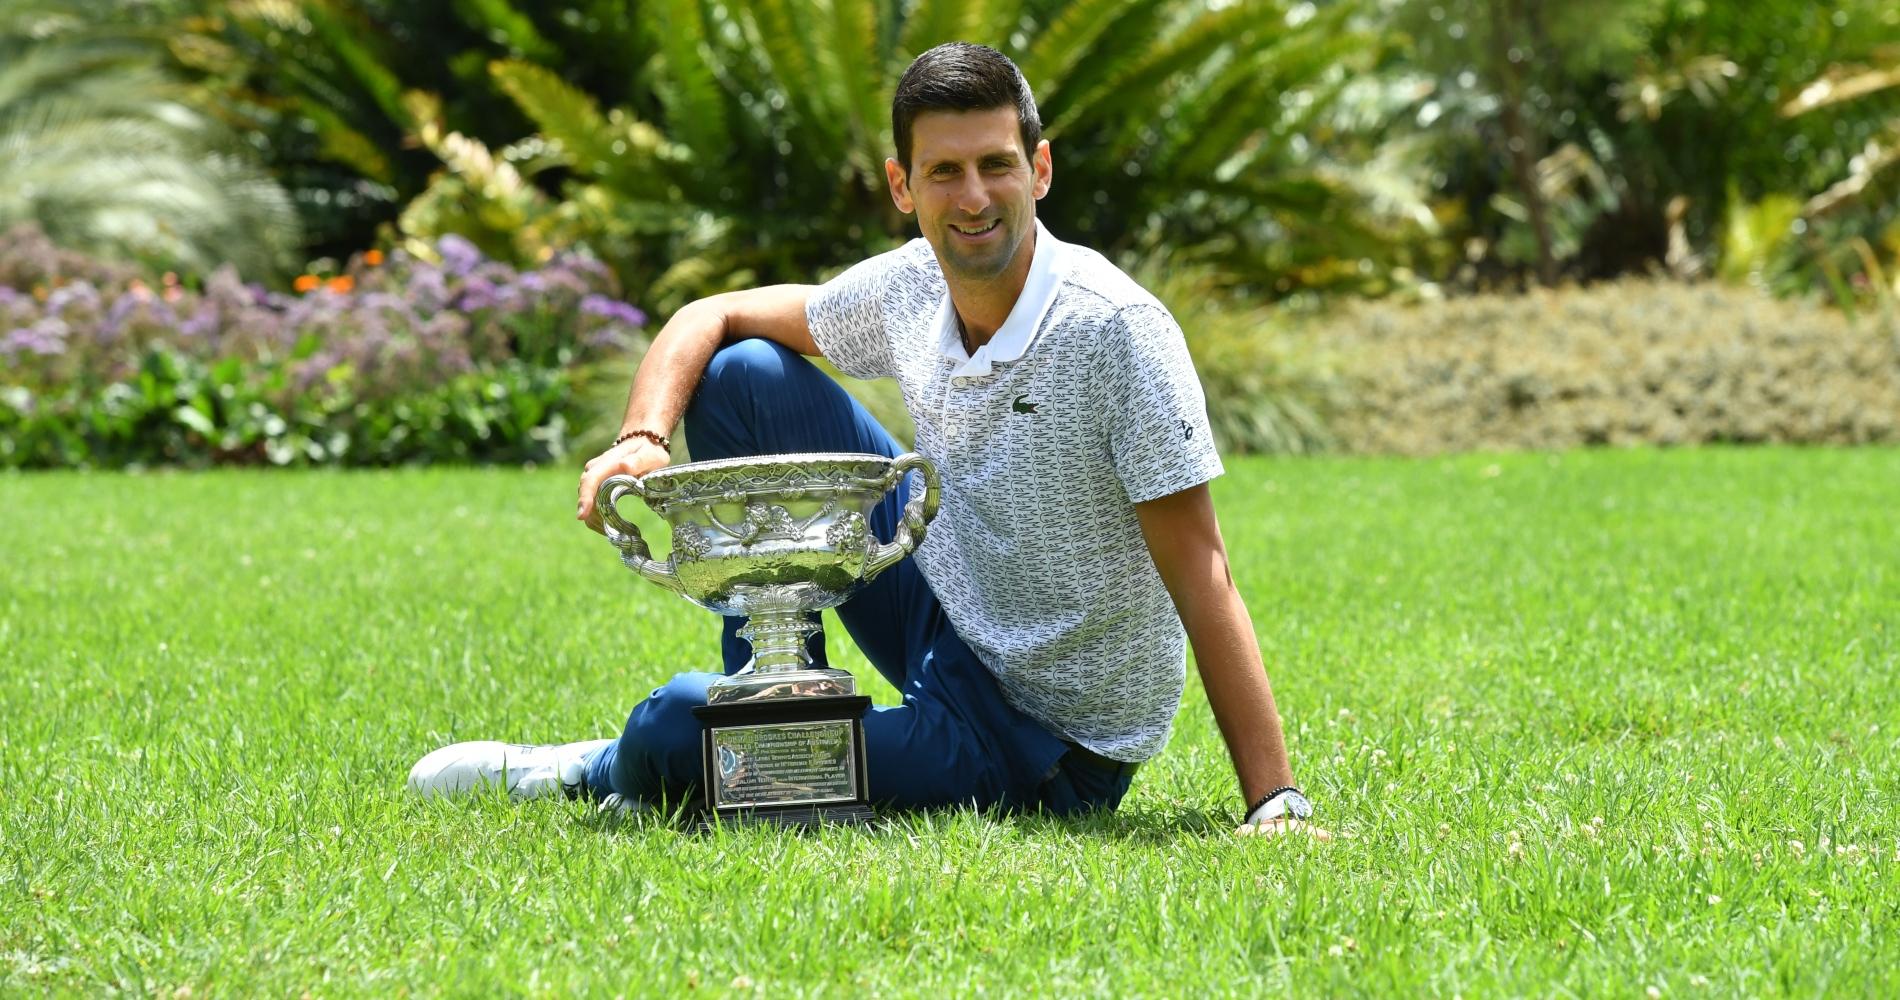 Novak Djokovic after his 2020 Australian Open title